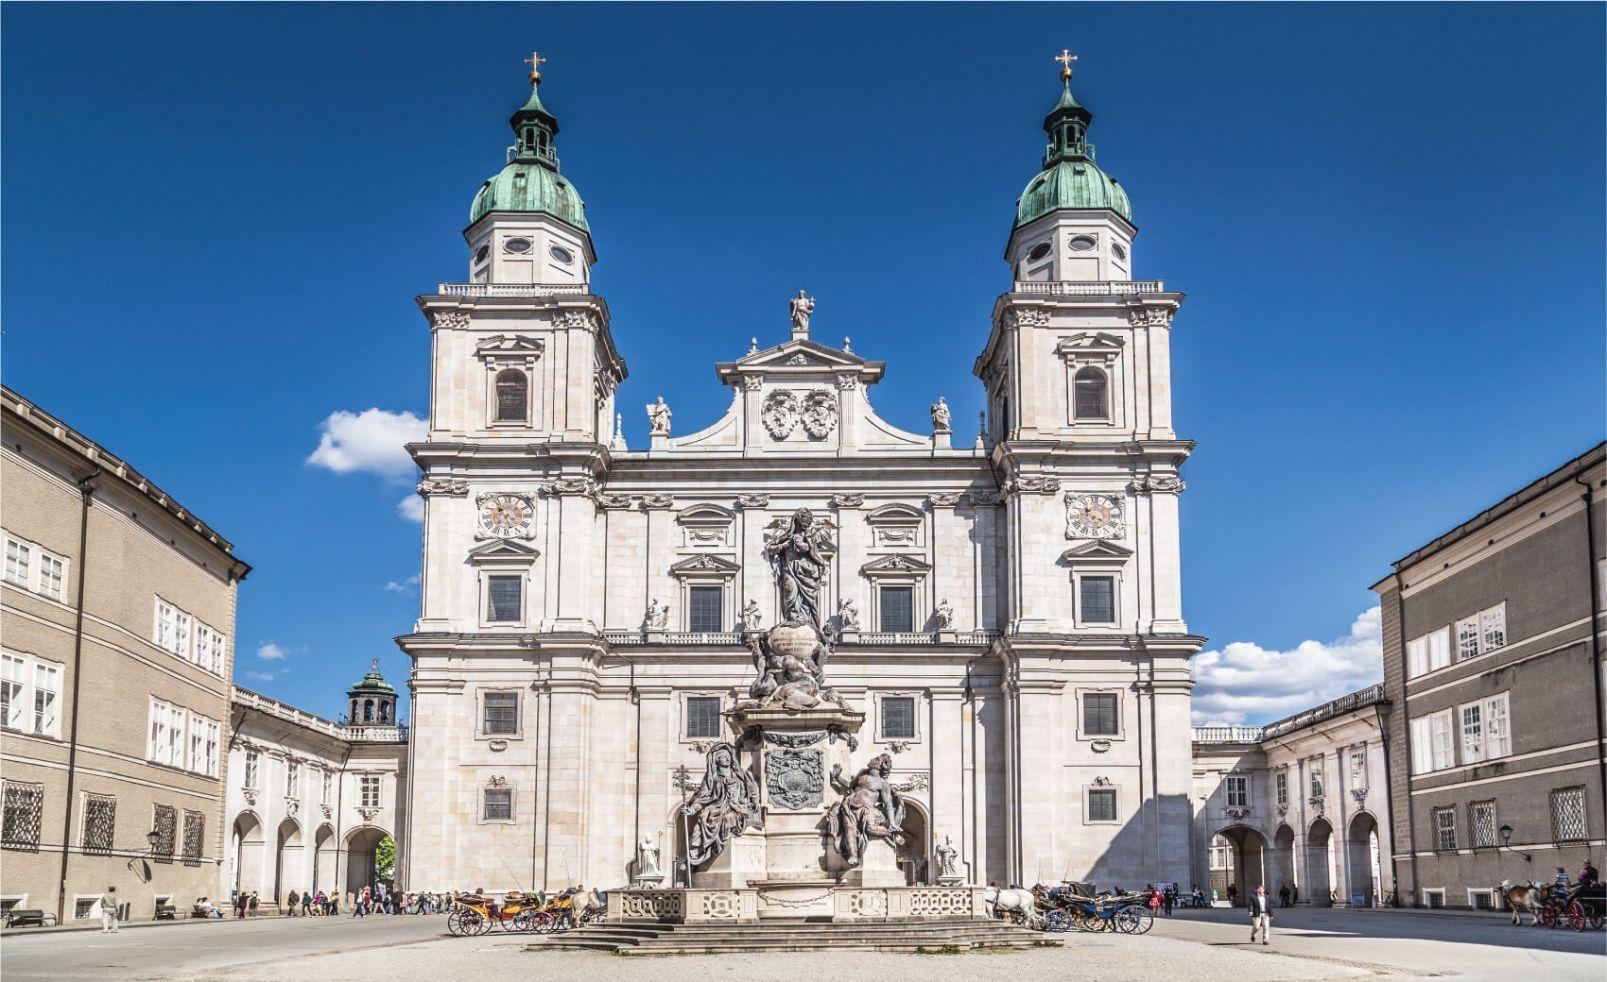 Famous Salzburg Cathedral Salzburger Dom at Domplatz